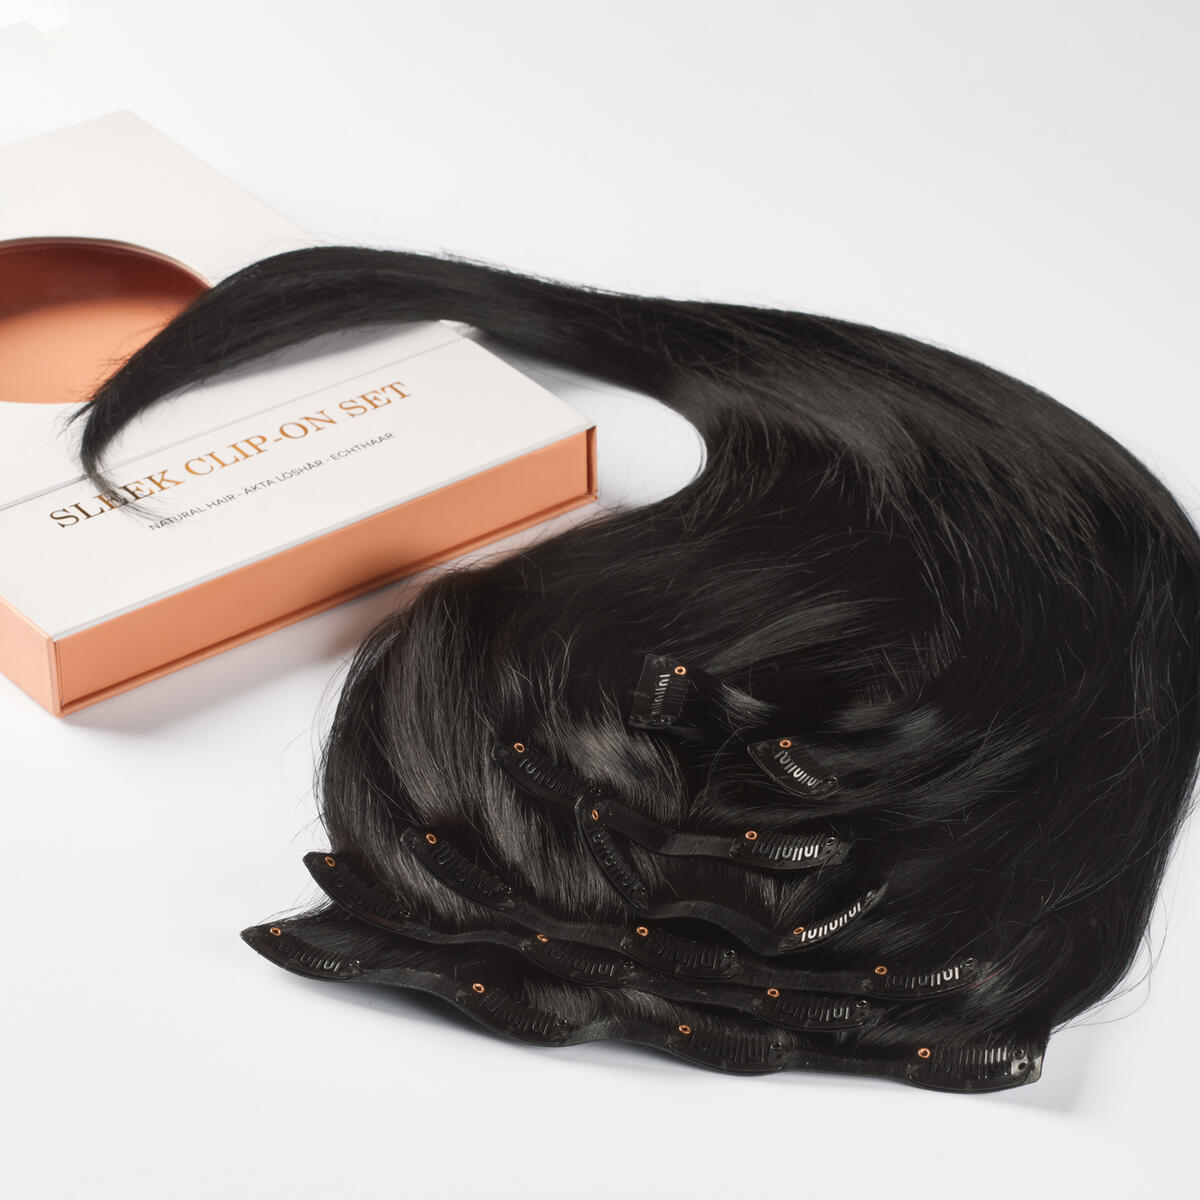 Sleek Clip-on set 1.0 Black 50 cm